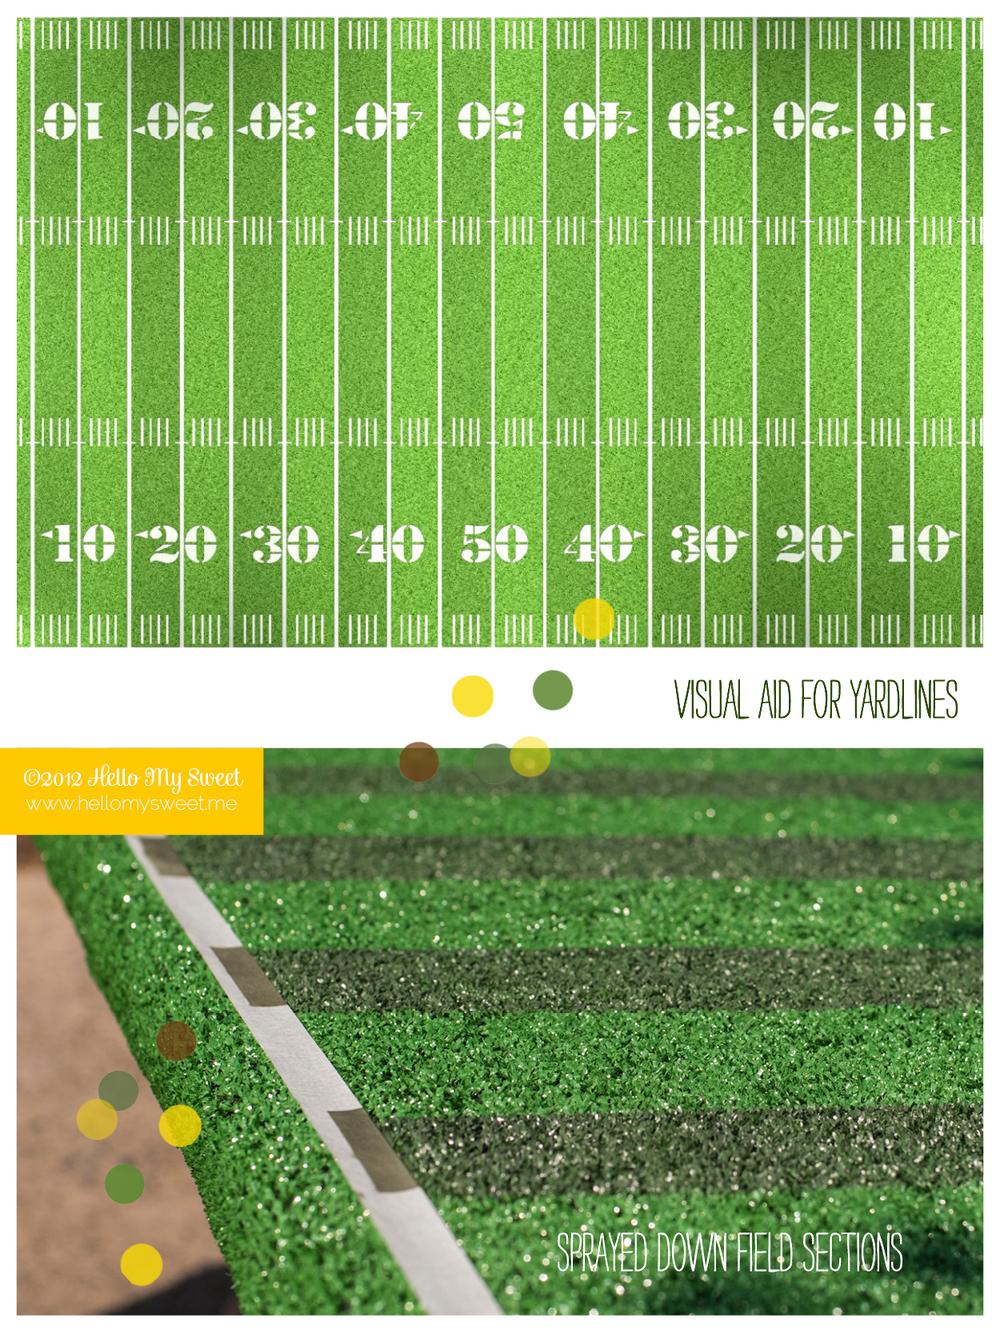 Football Field Carpet Vidalondon